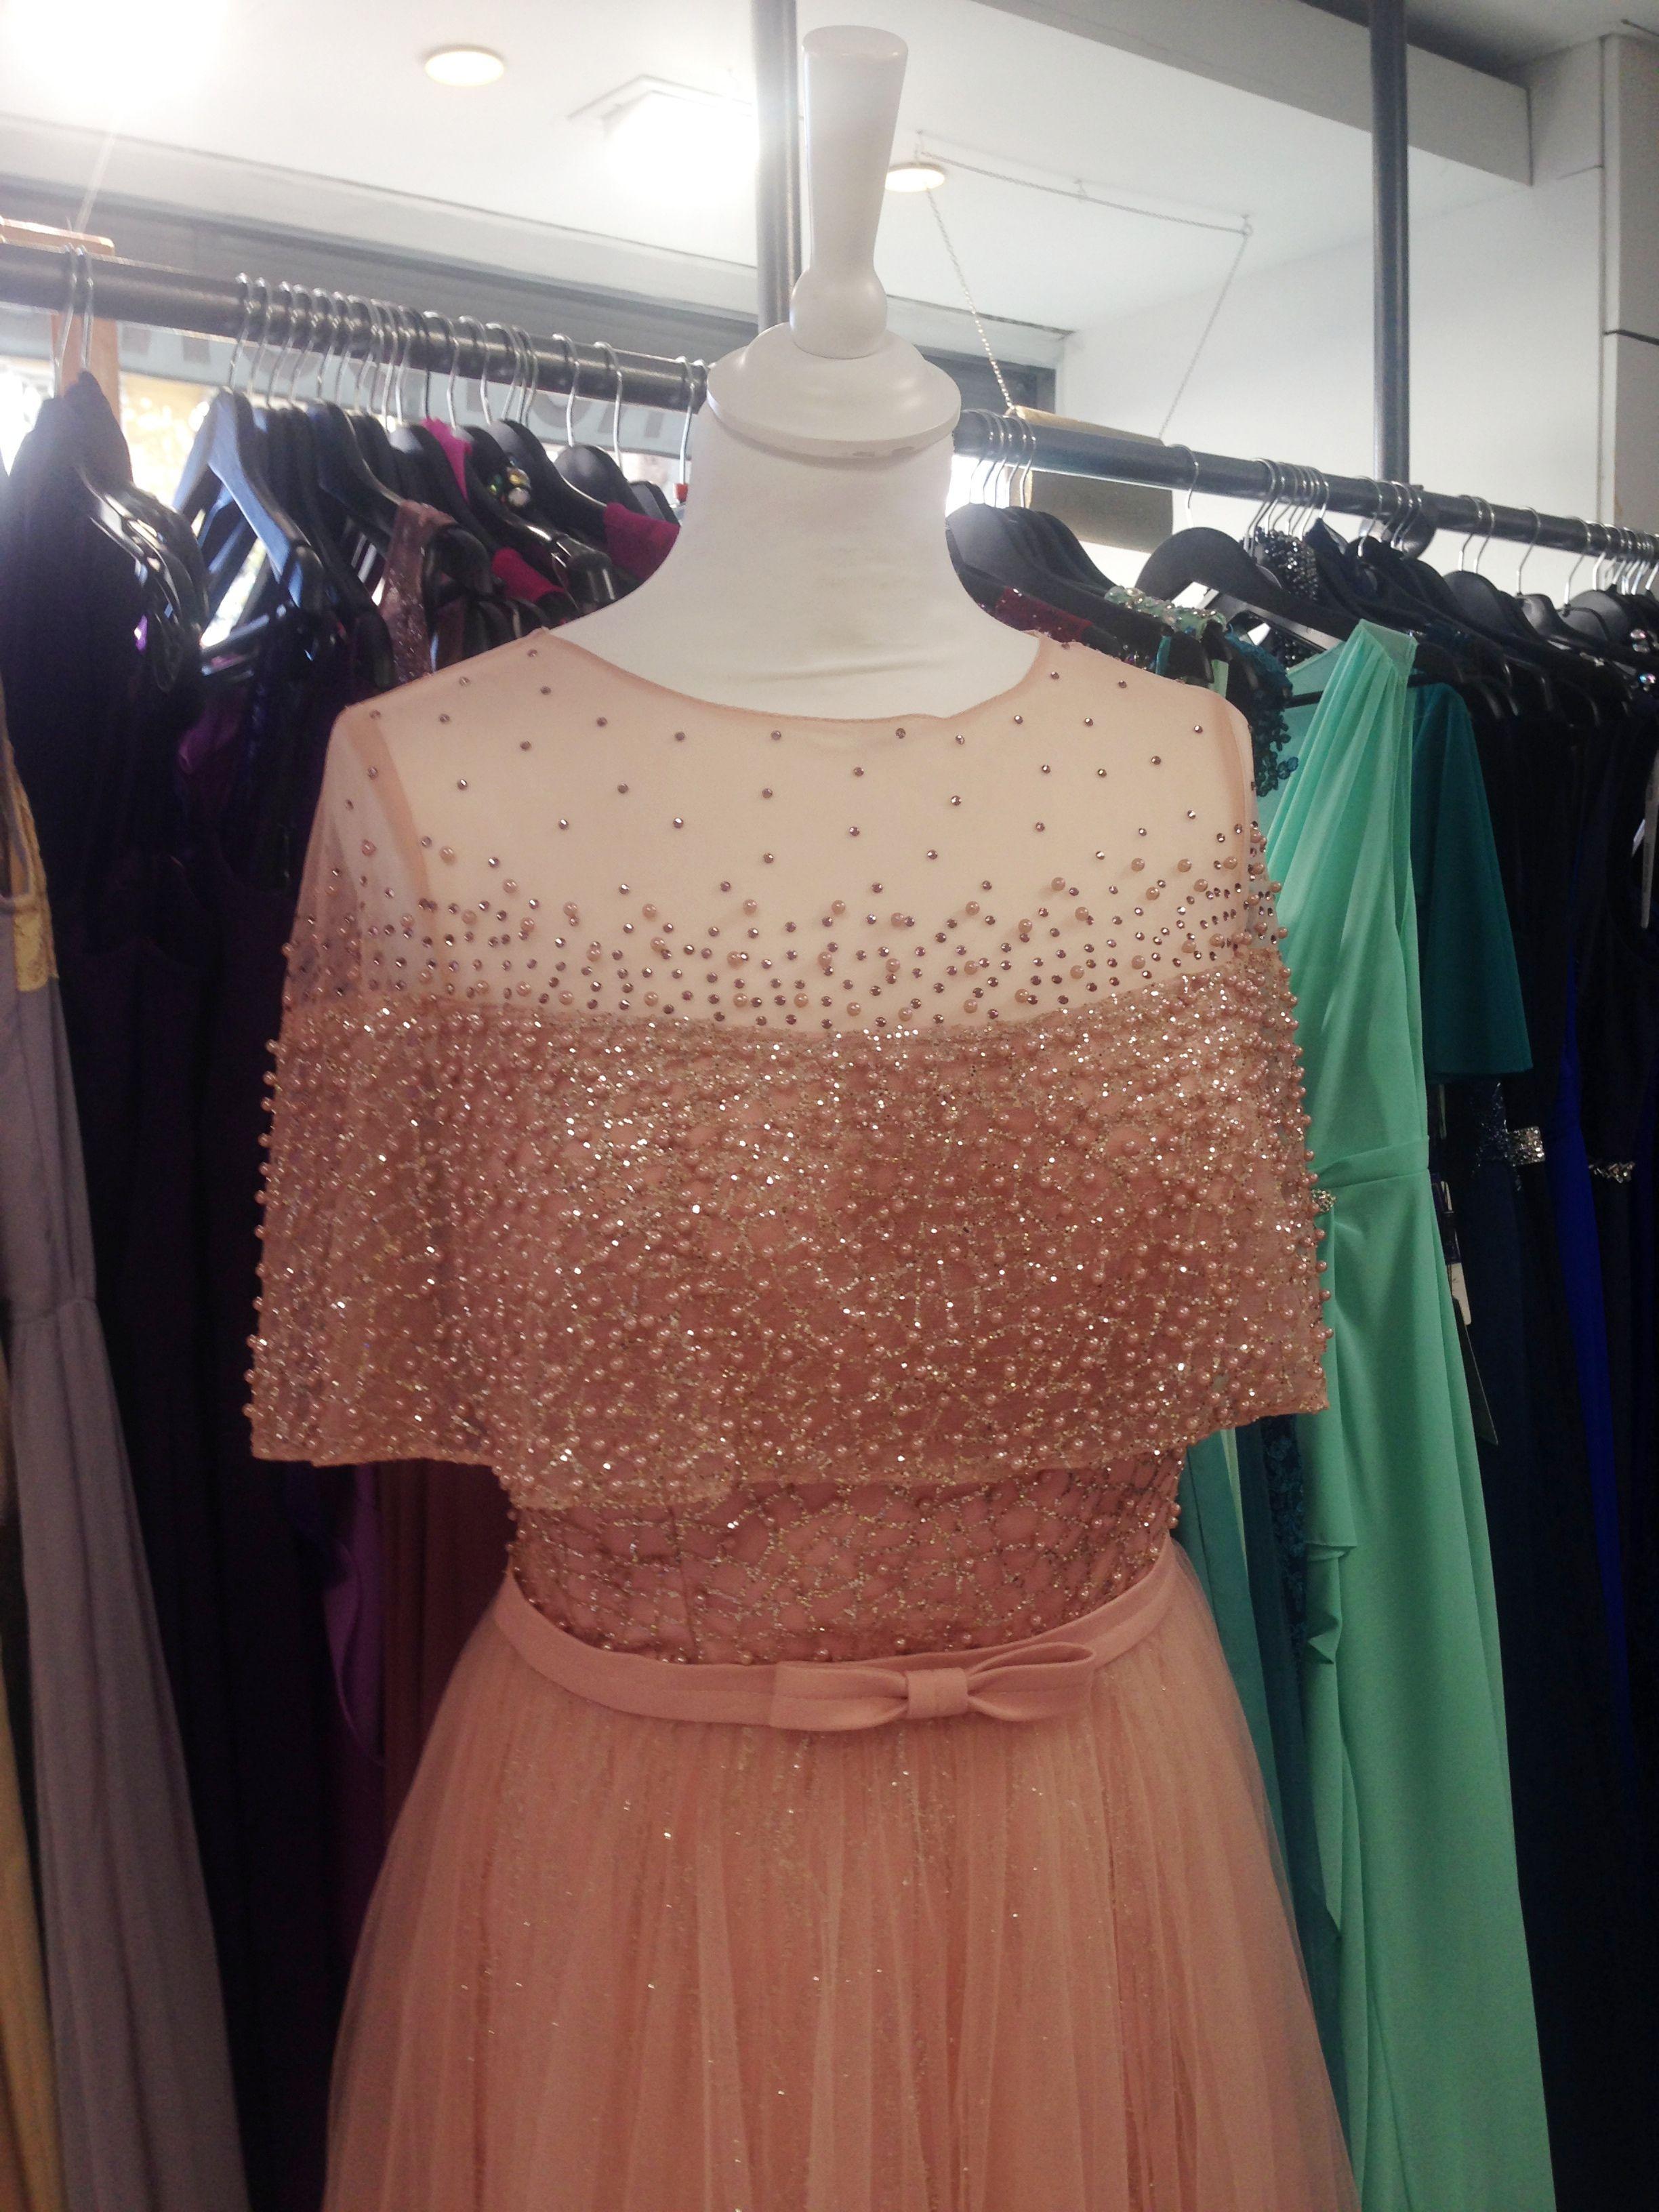 robe longue vieux rose rose poudr tulle perles et strass avec manches retro vintage robe